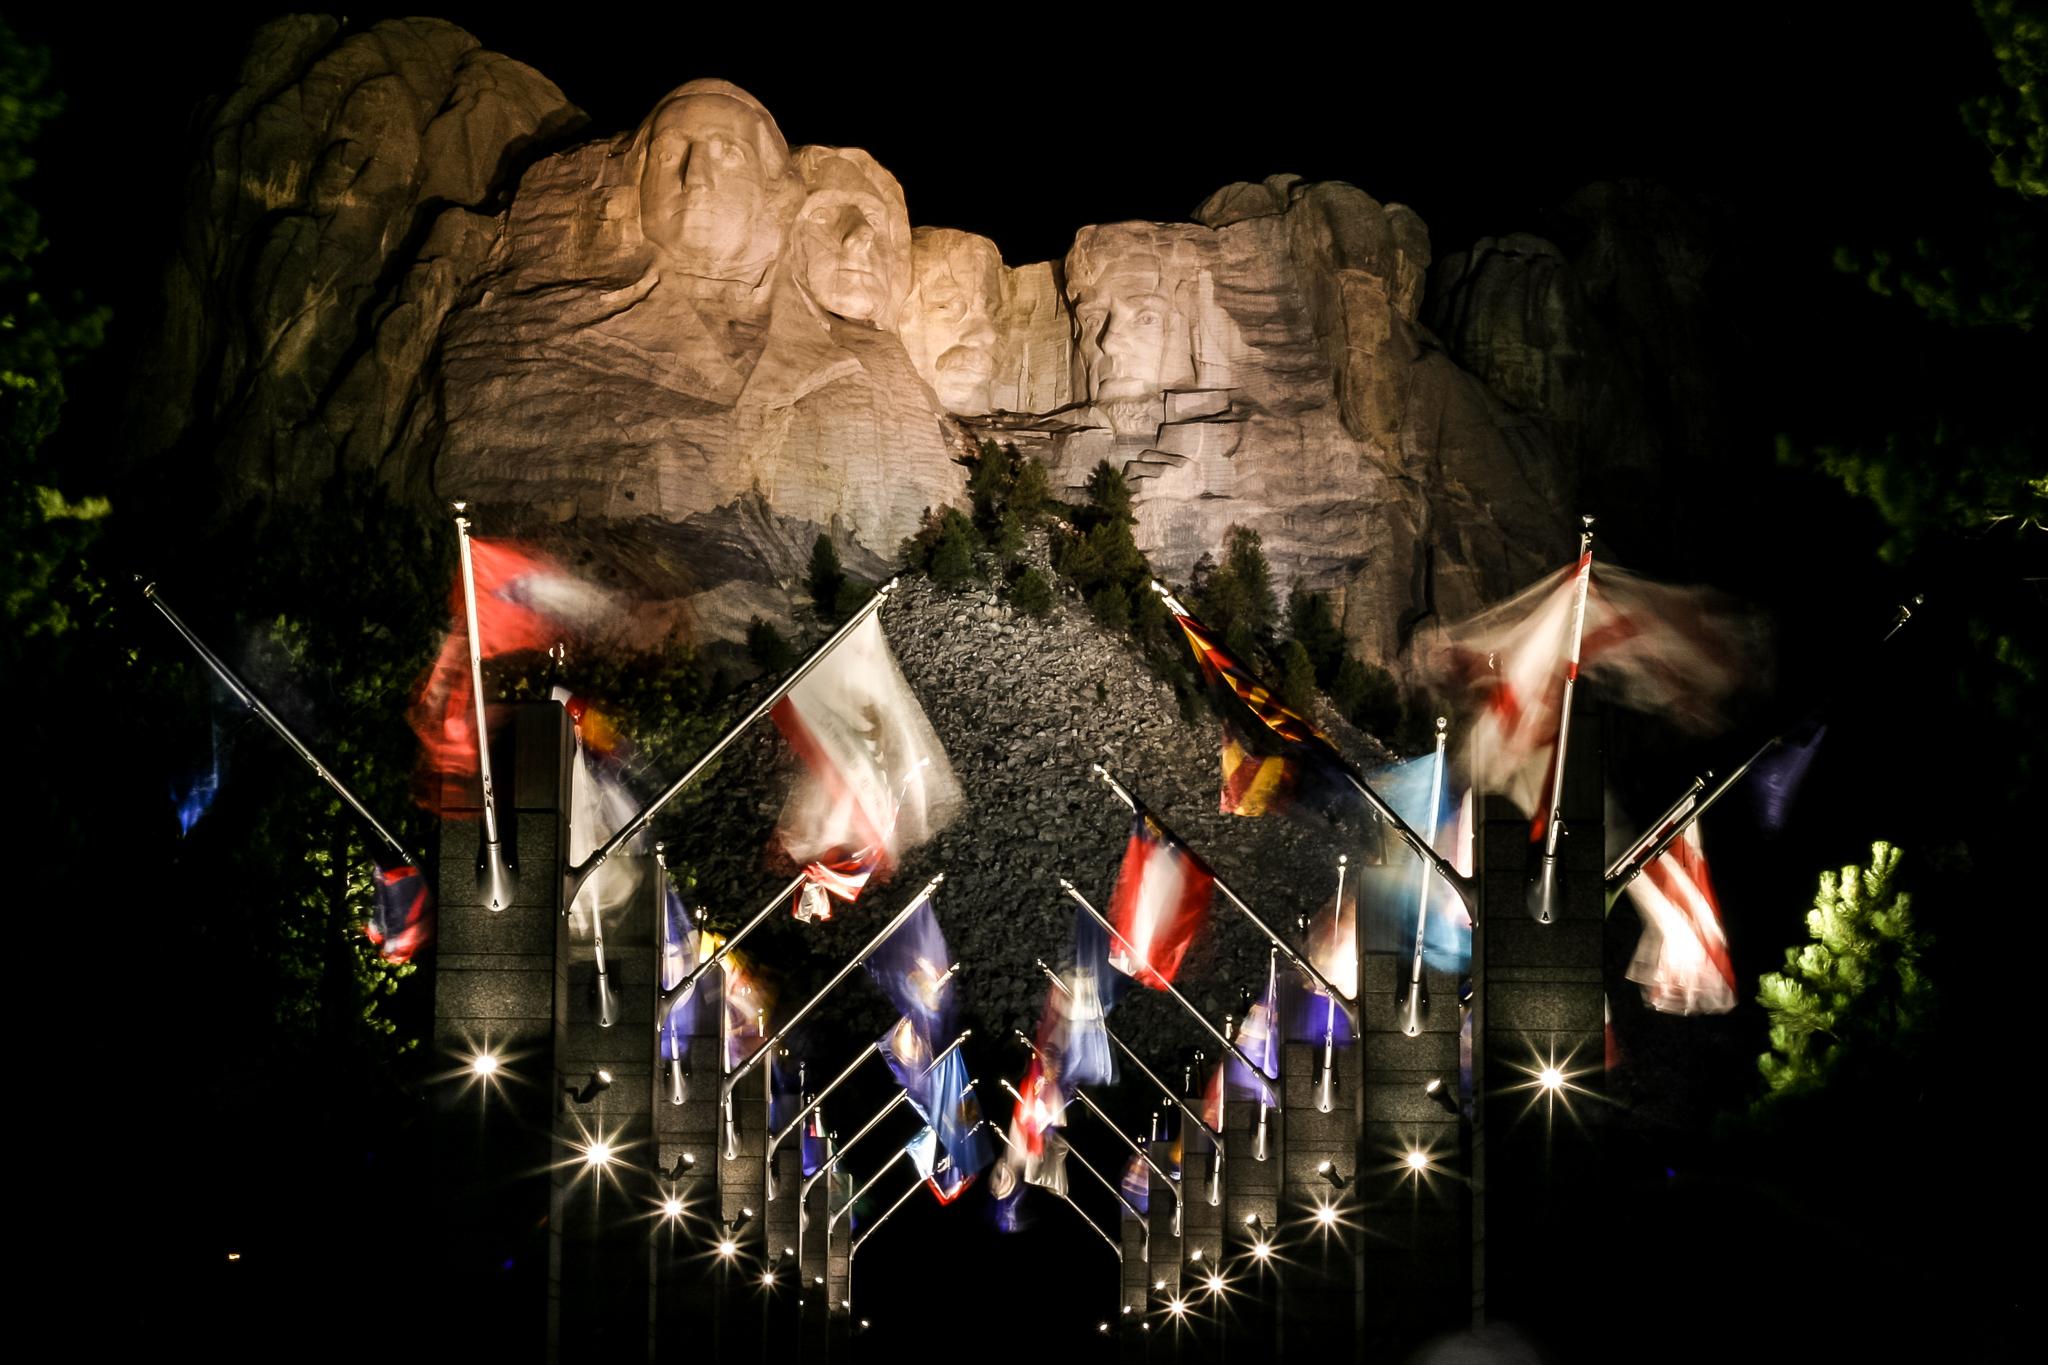 Evening Lighting Ceremony At Mount Rushmore Black Hills